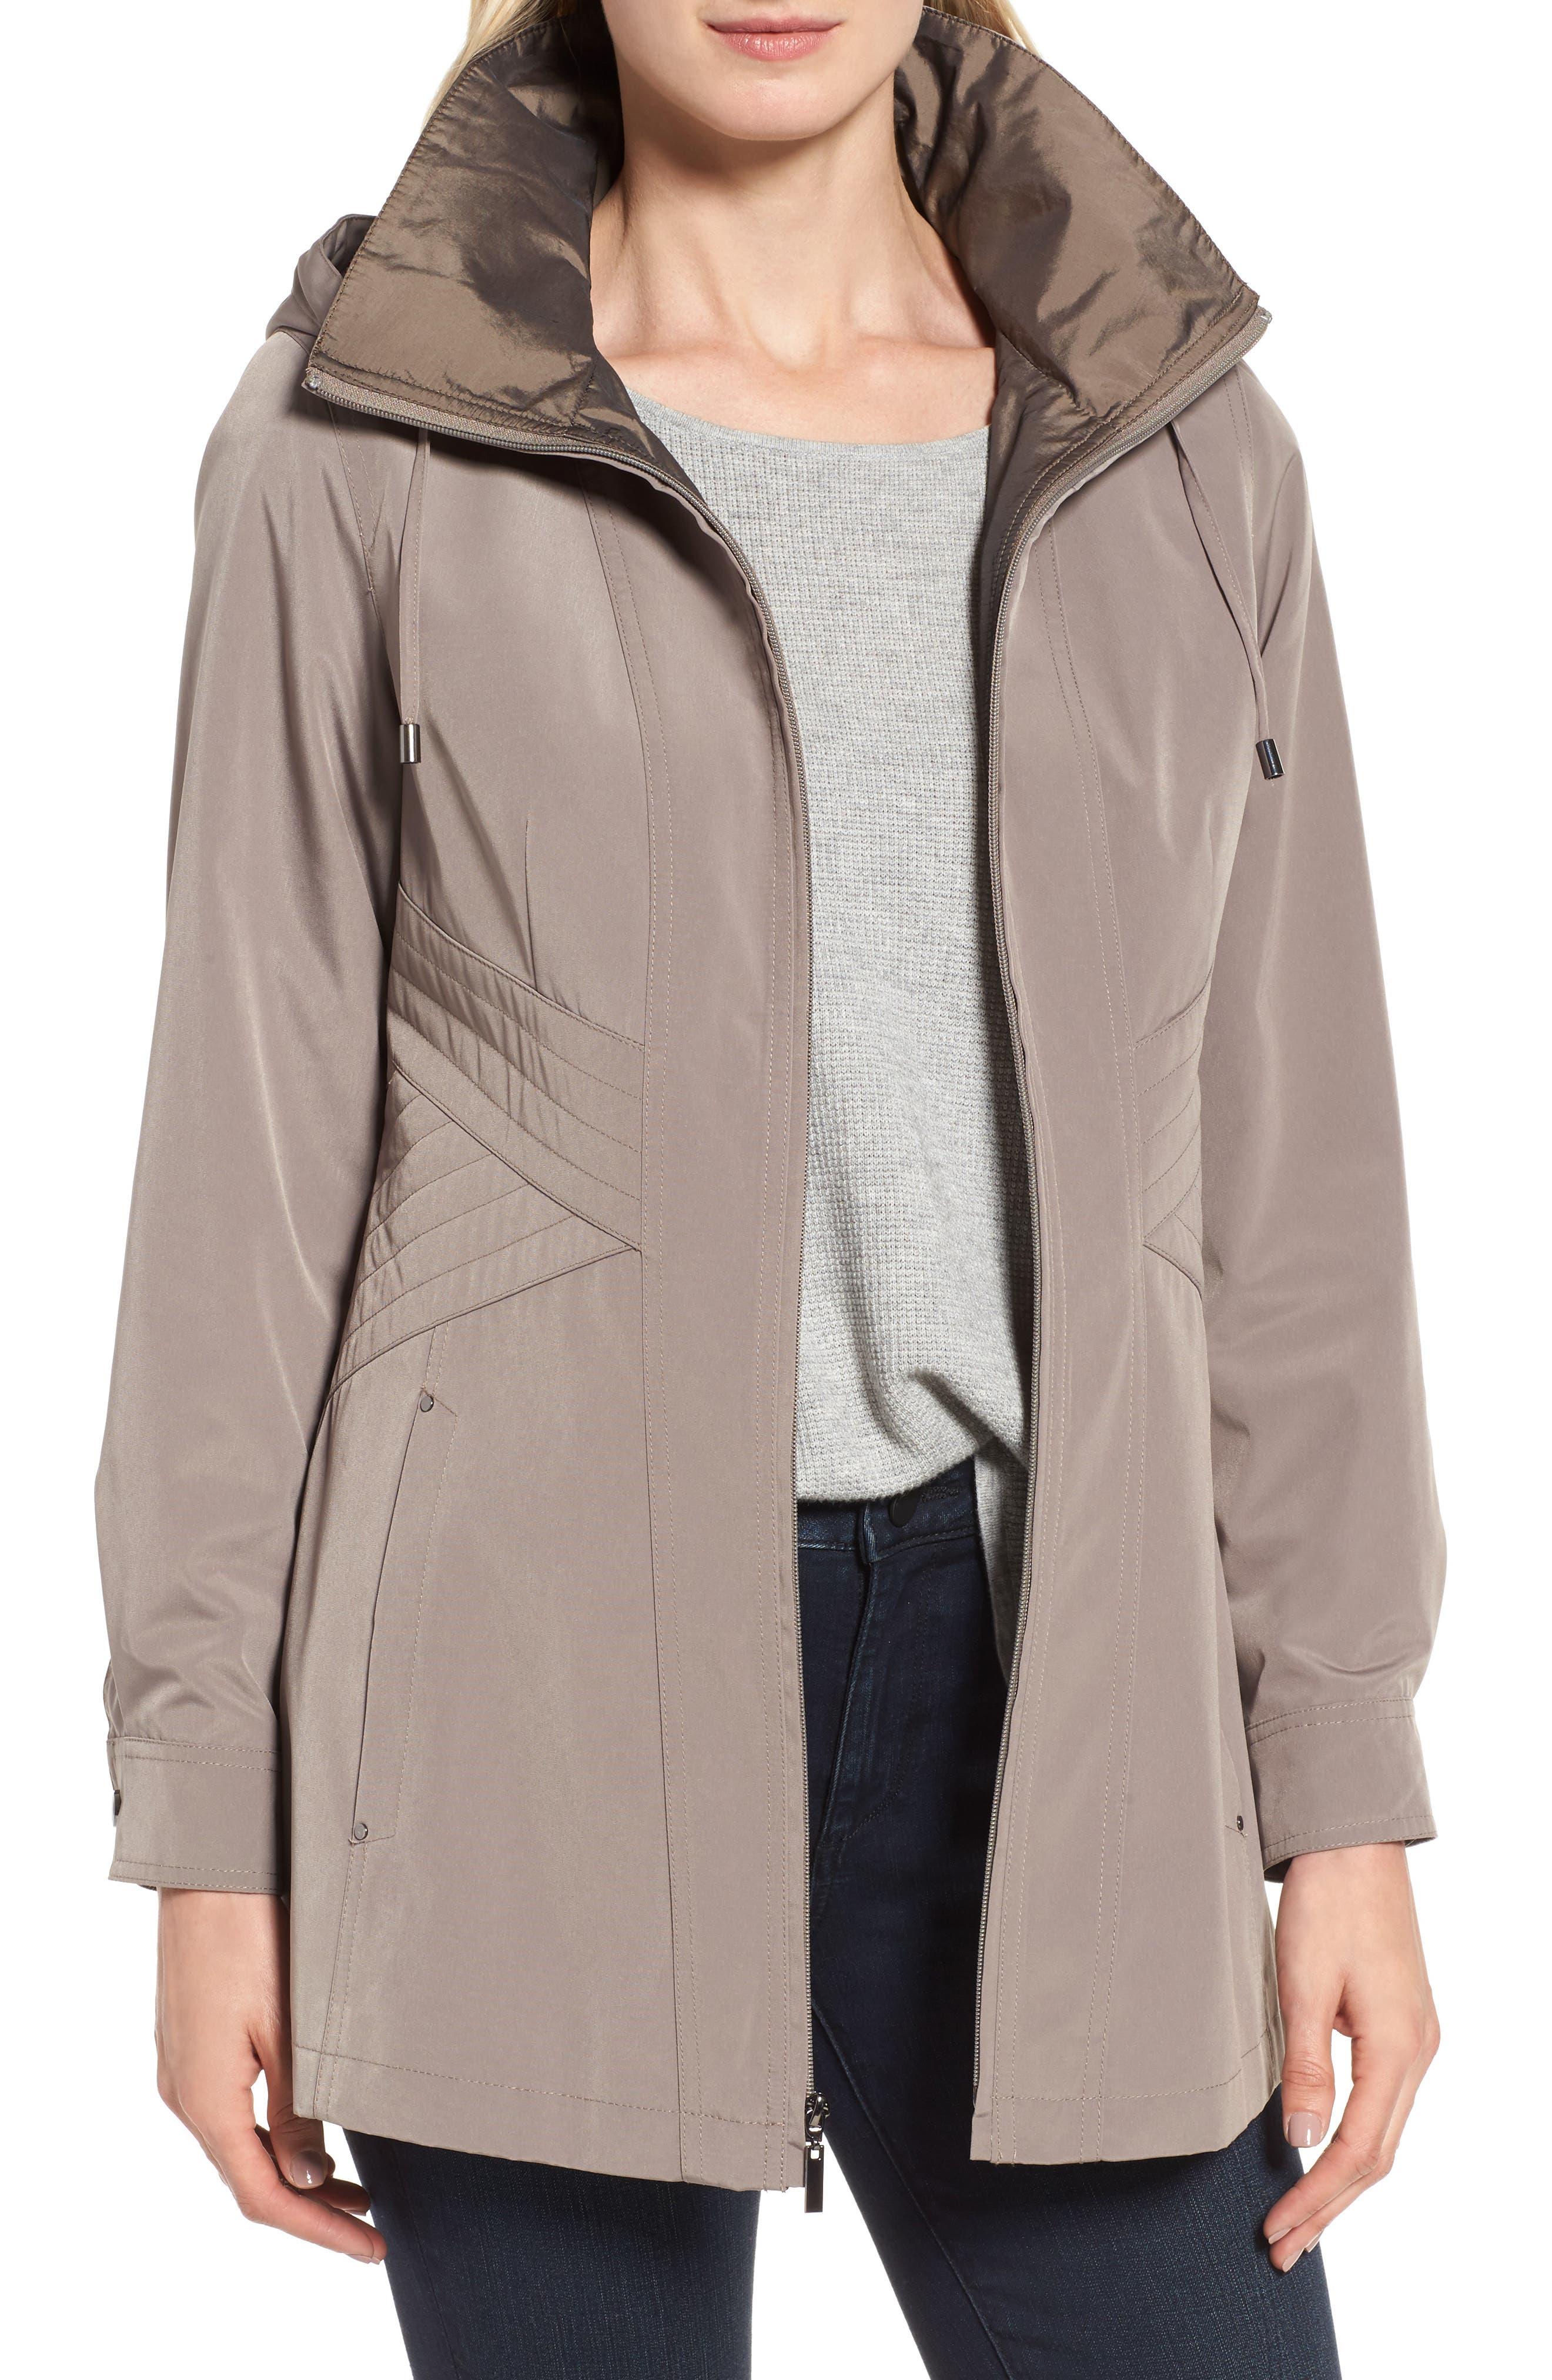 Main Image - Gallery Two-Tone Long Silk Look Raincoat